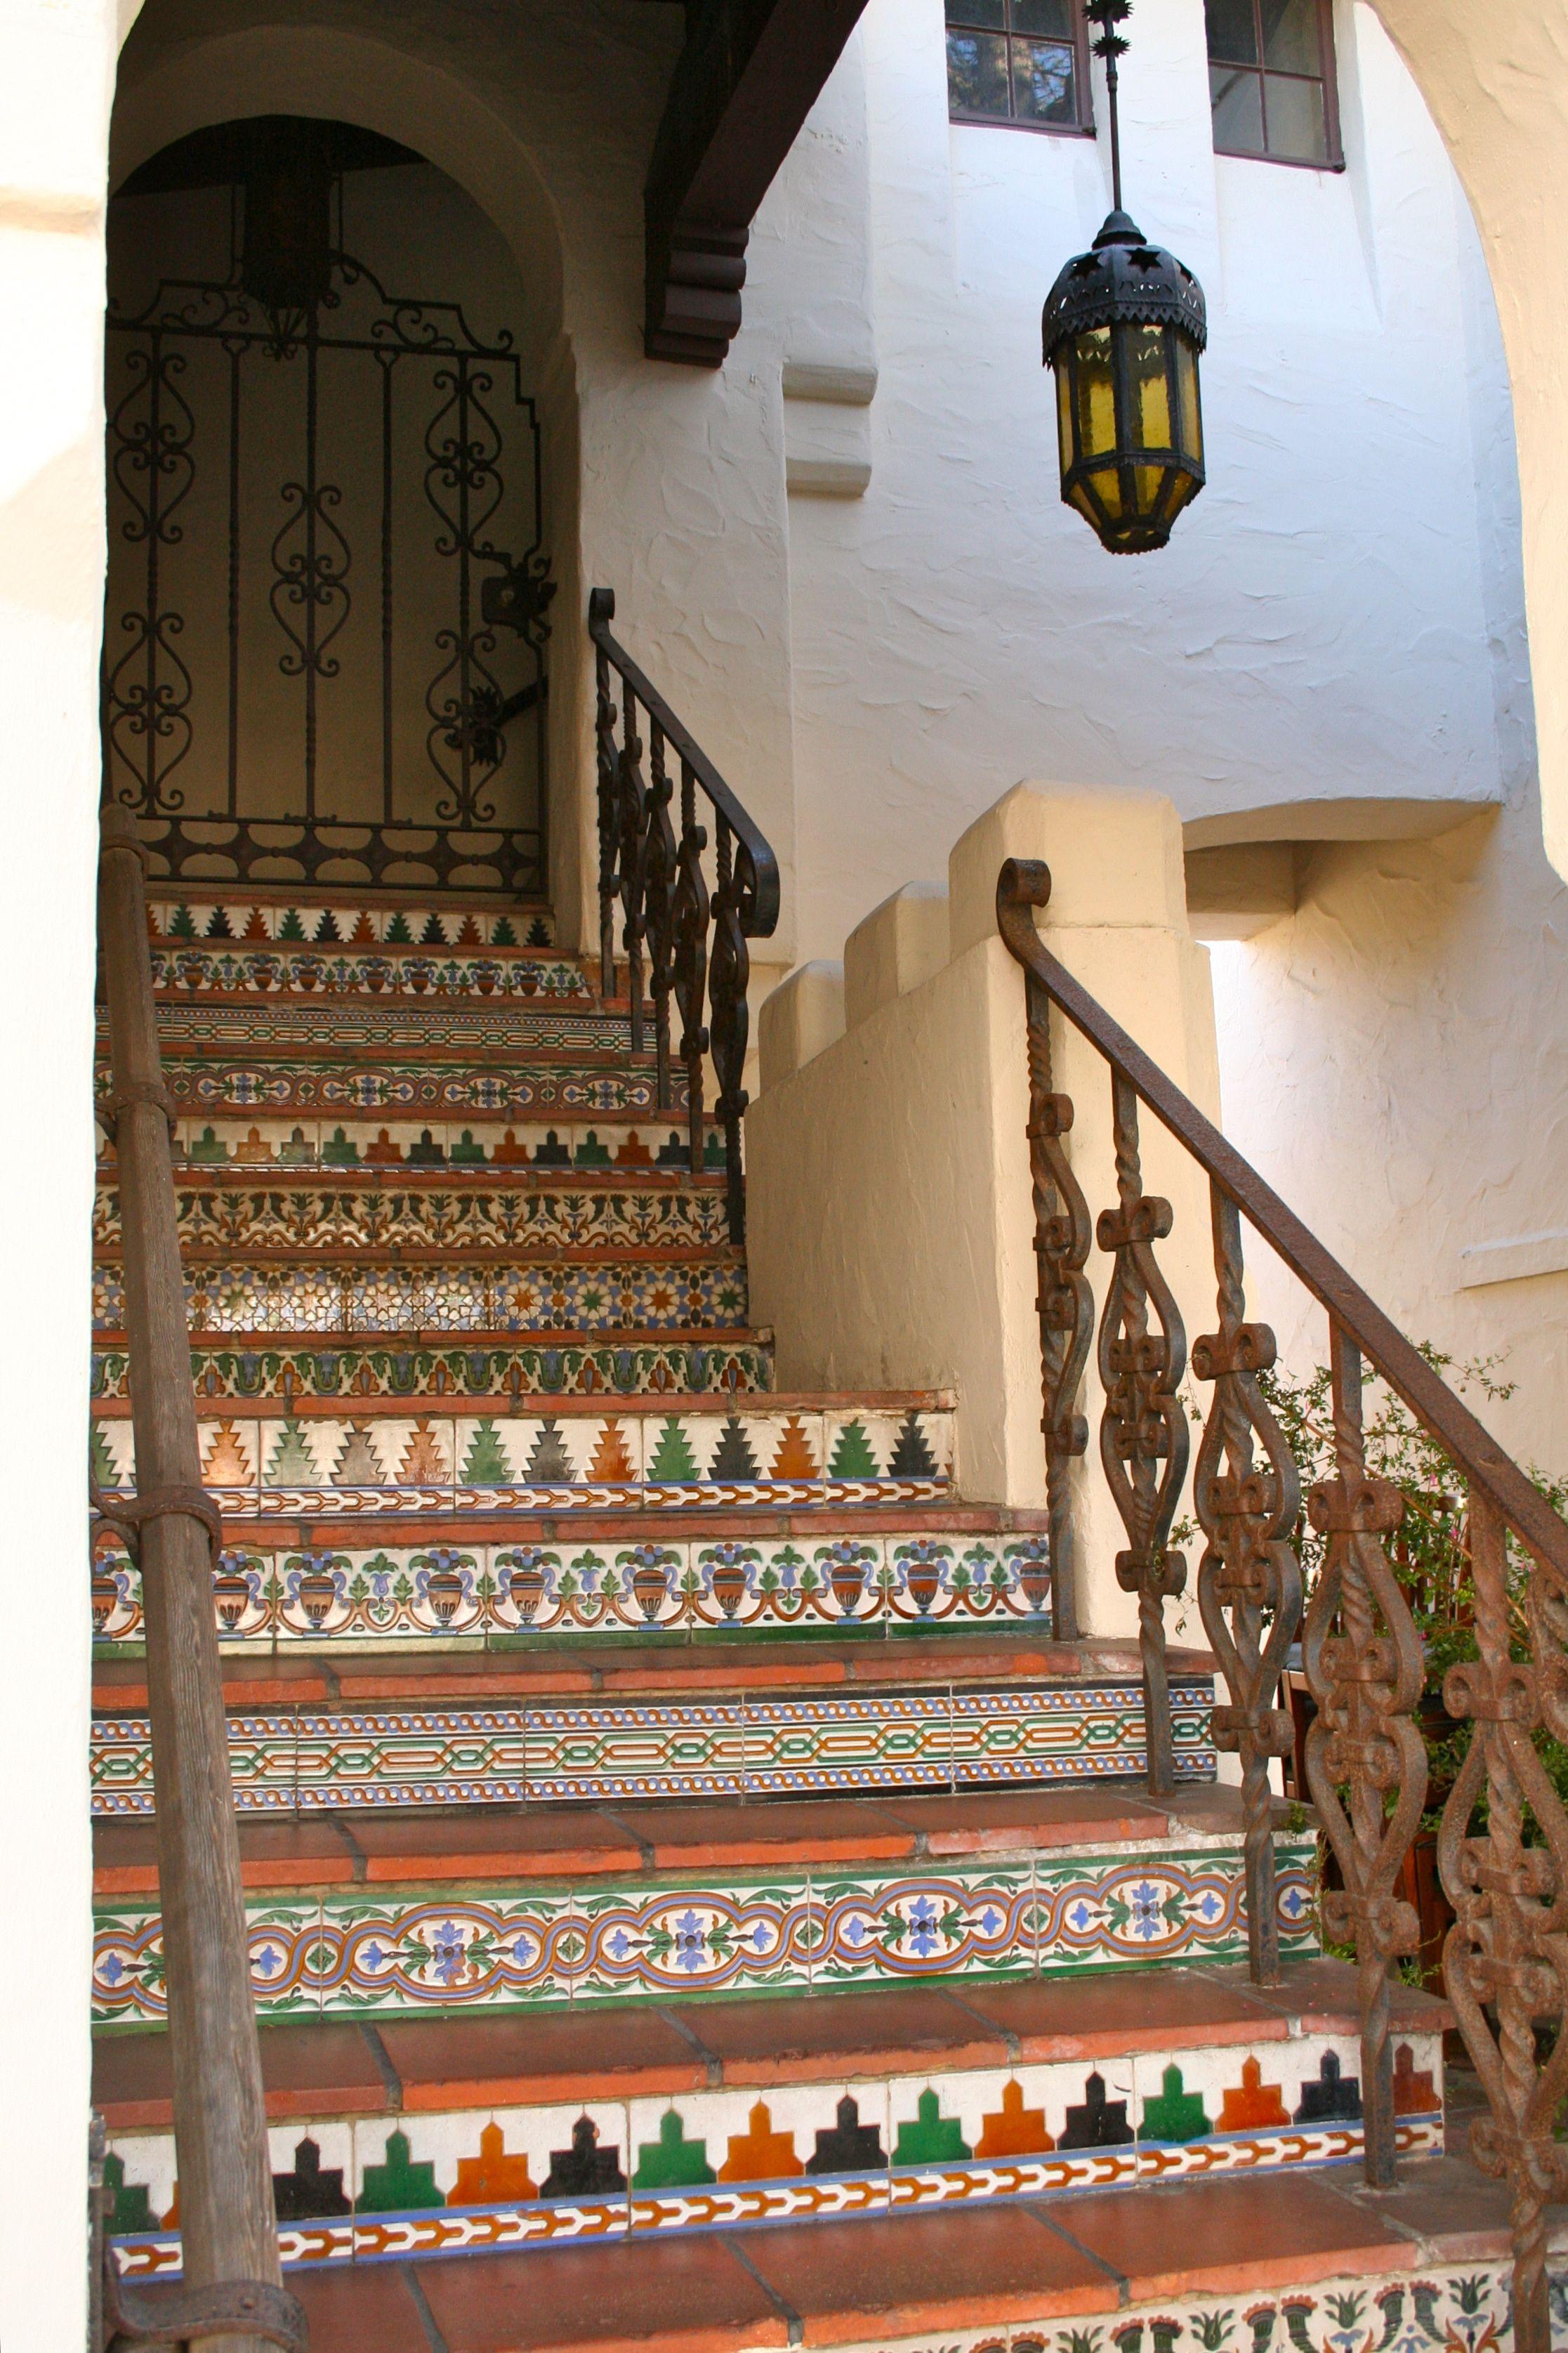 Spanish Tile And Wrought Iron Railing In Carmel Spanish